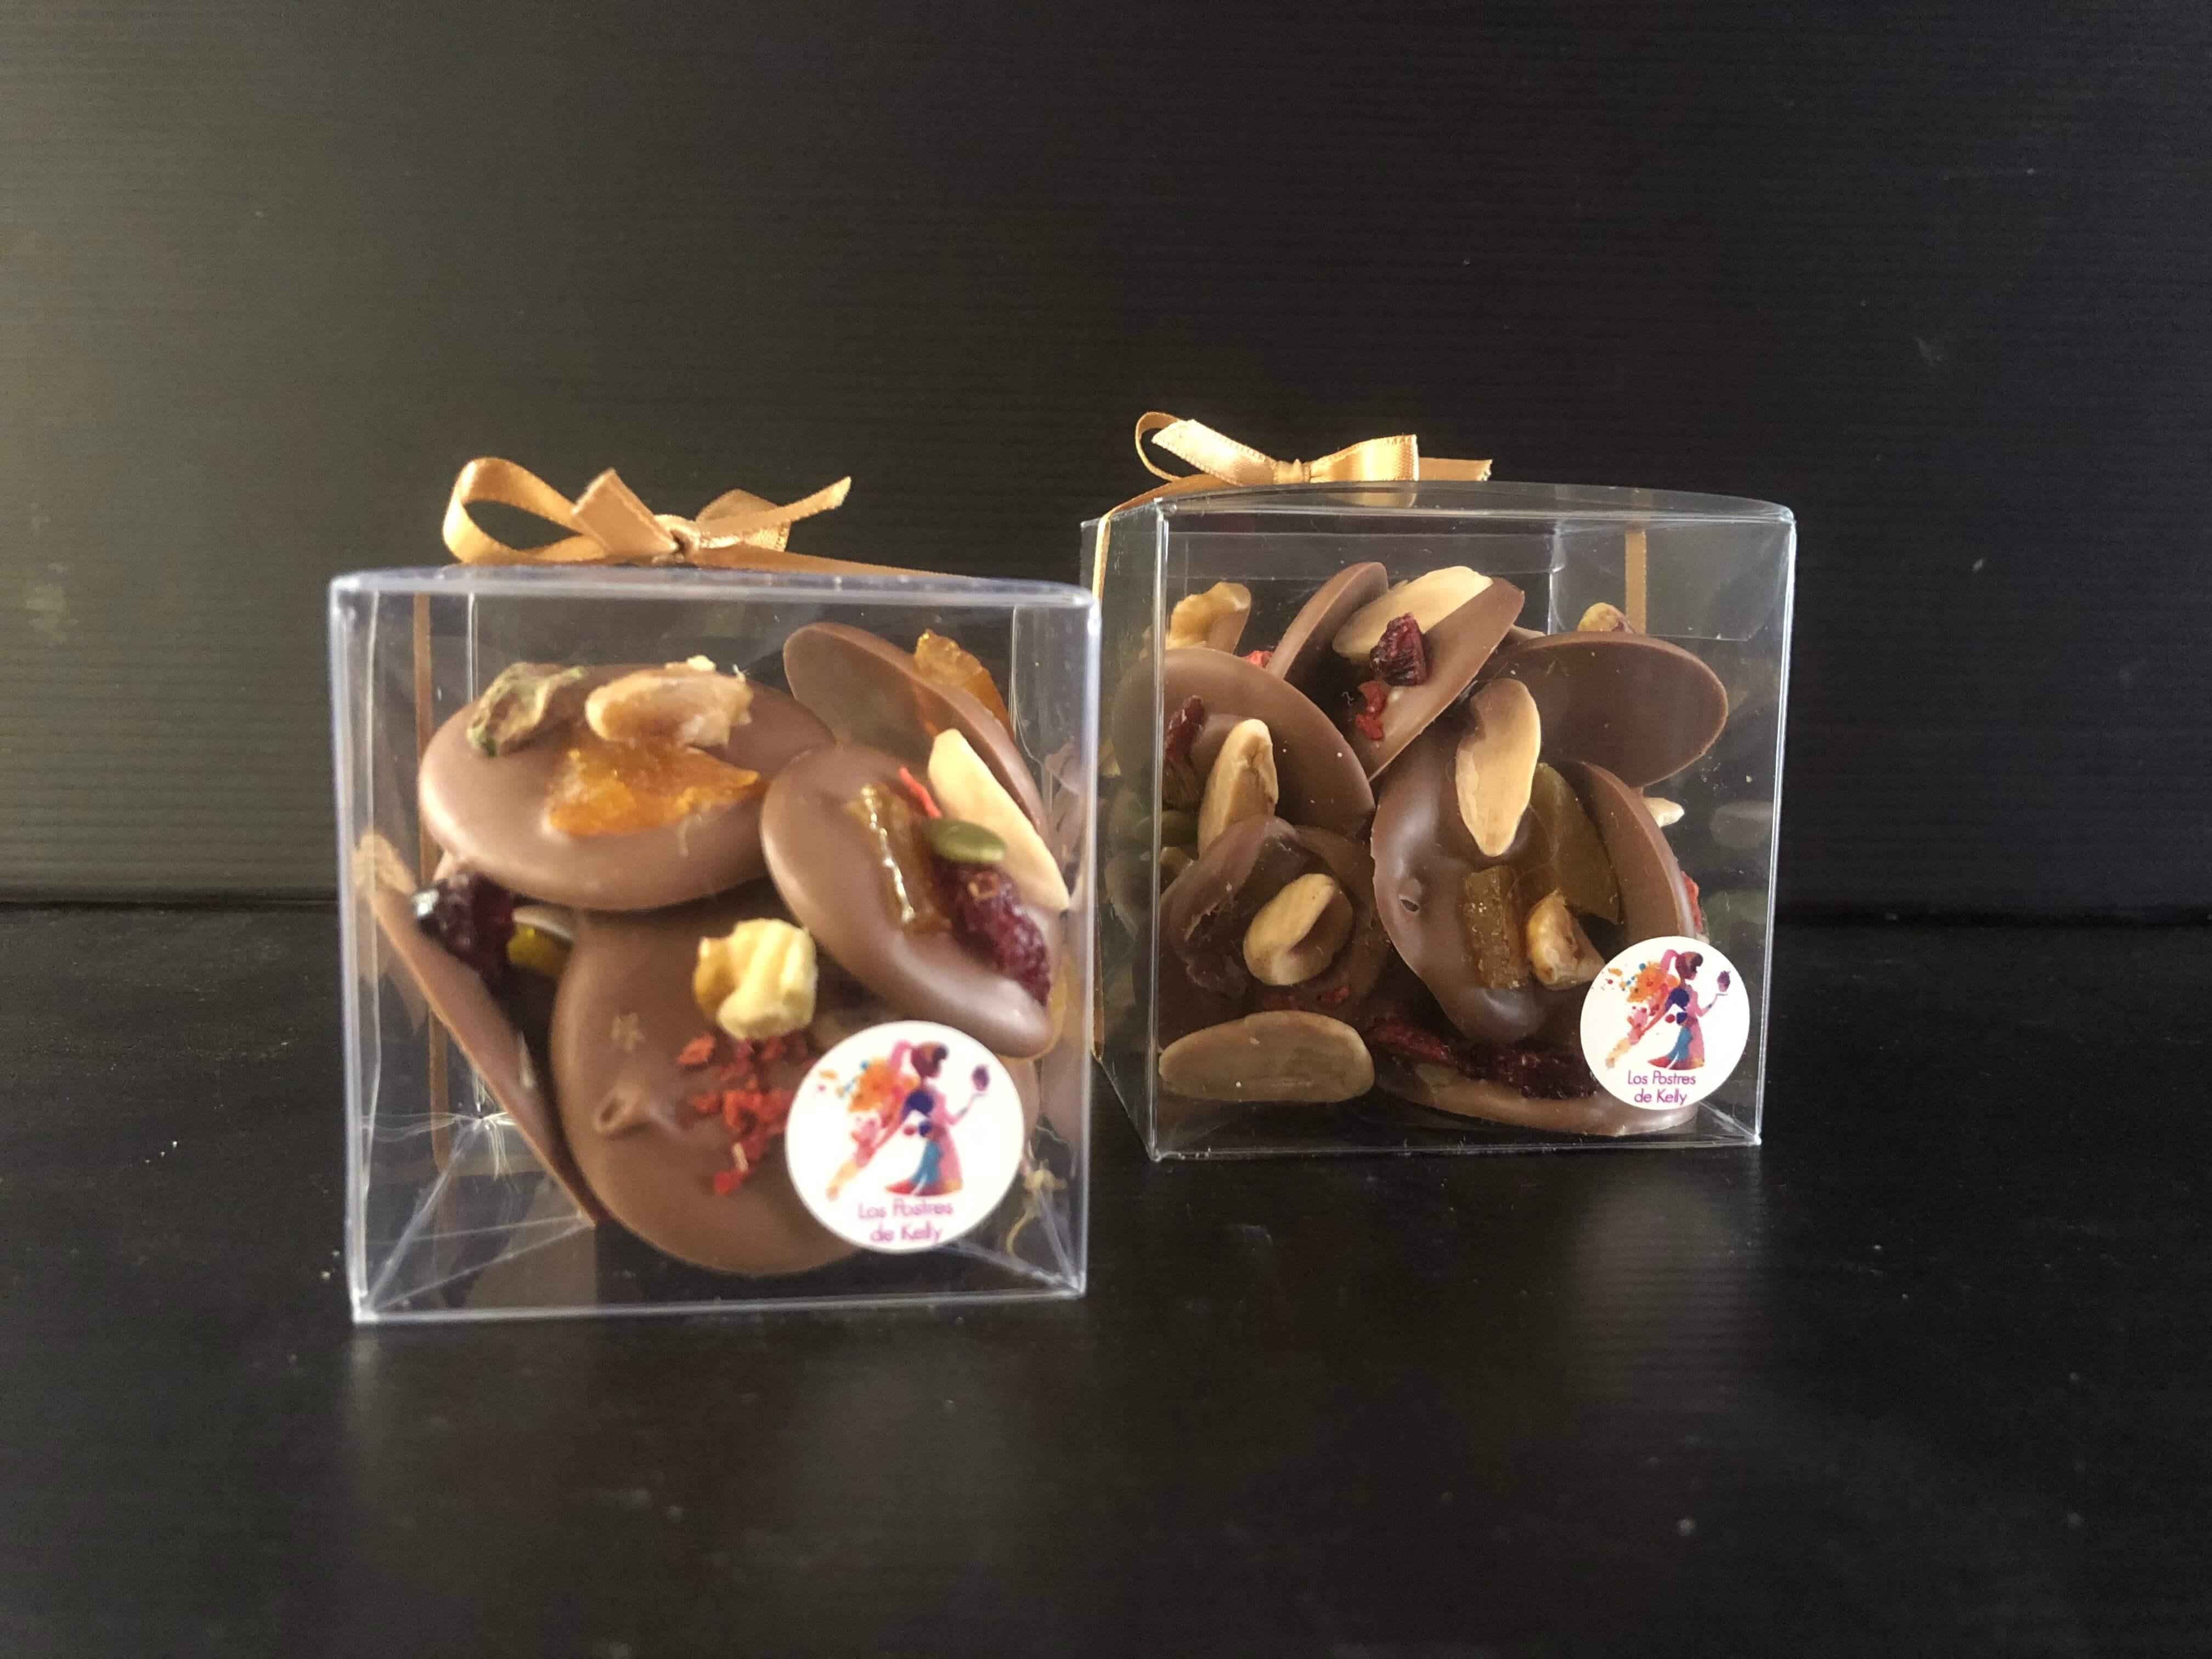 trufas de chocolate coruña chocolatería coruña bombones trufas de mandarina